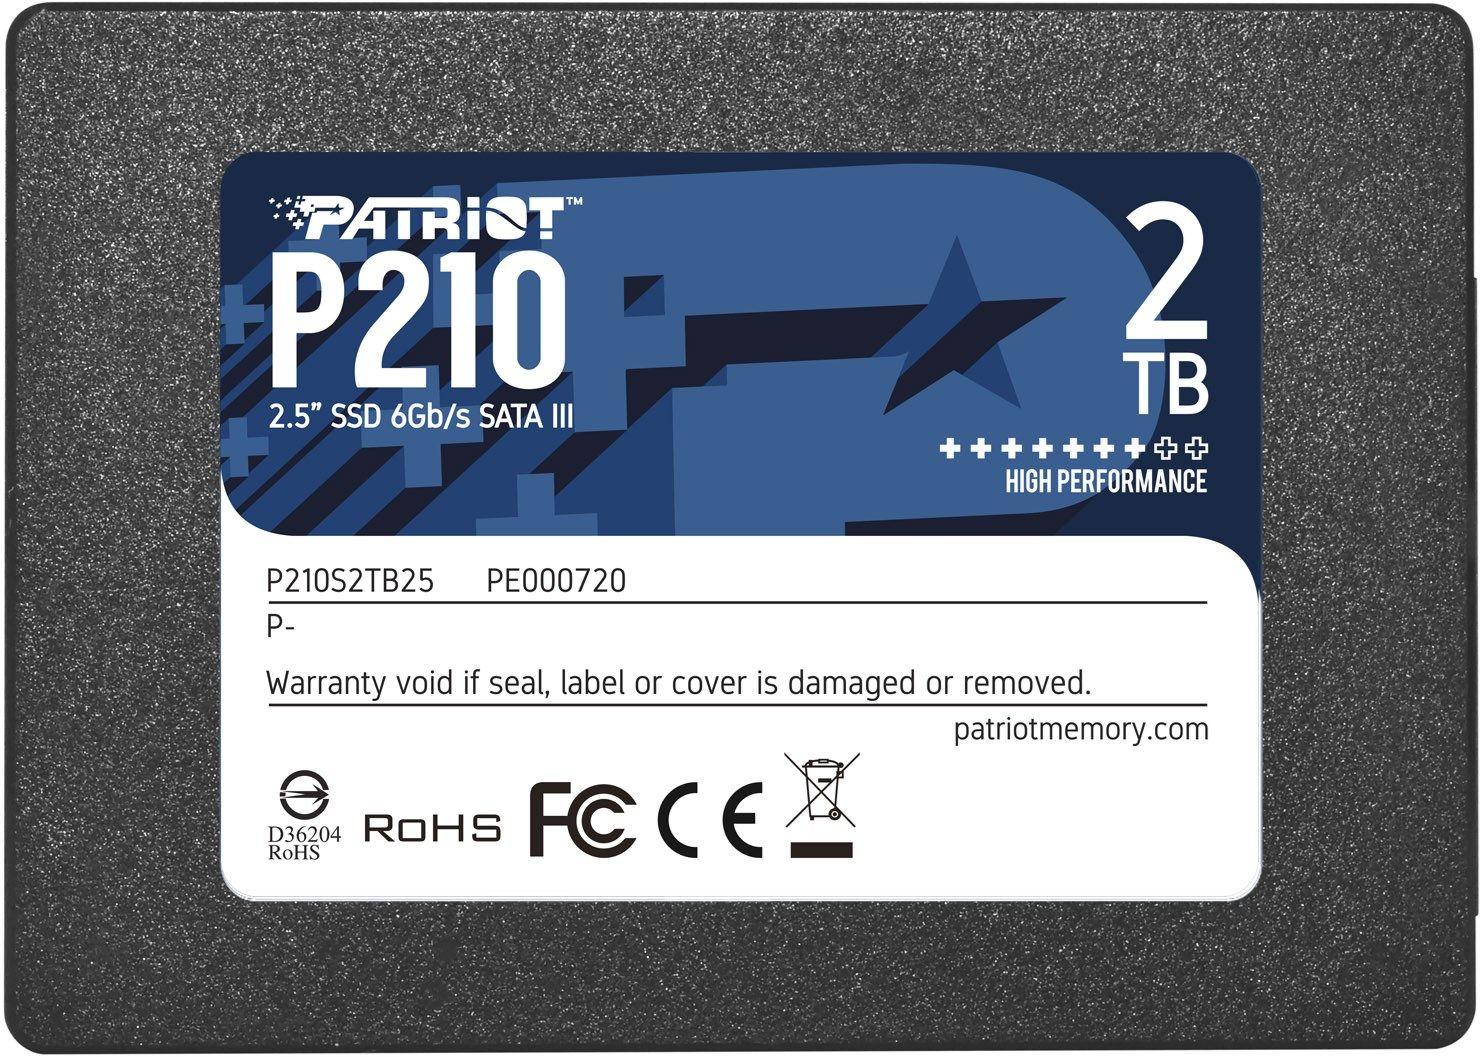 "Patriot Memory P210 2.5"" 2000 GB SATA III"